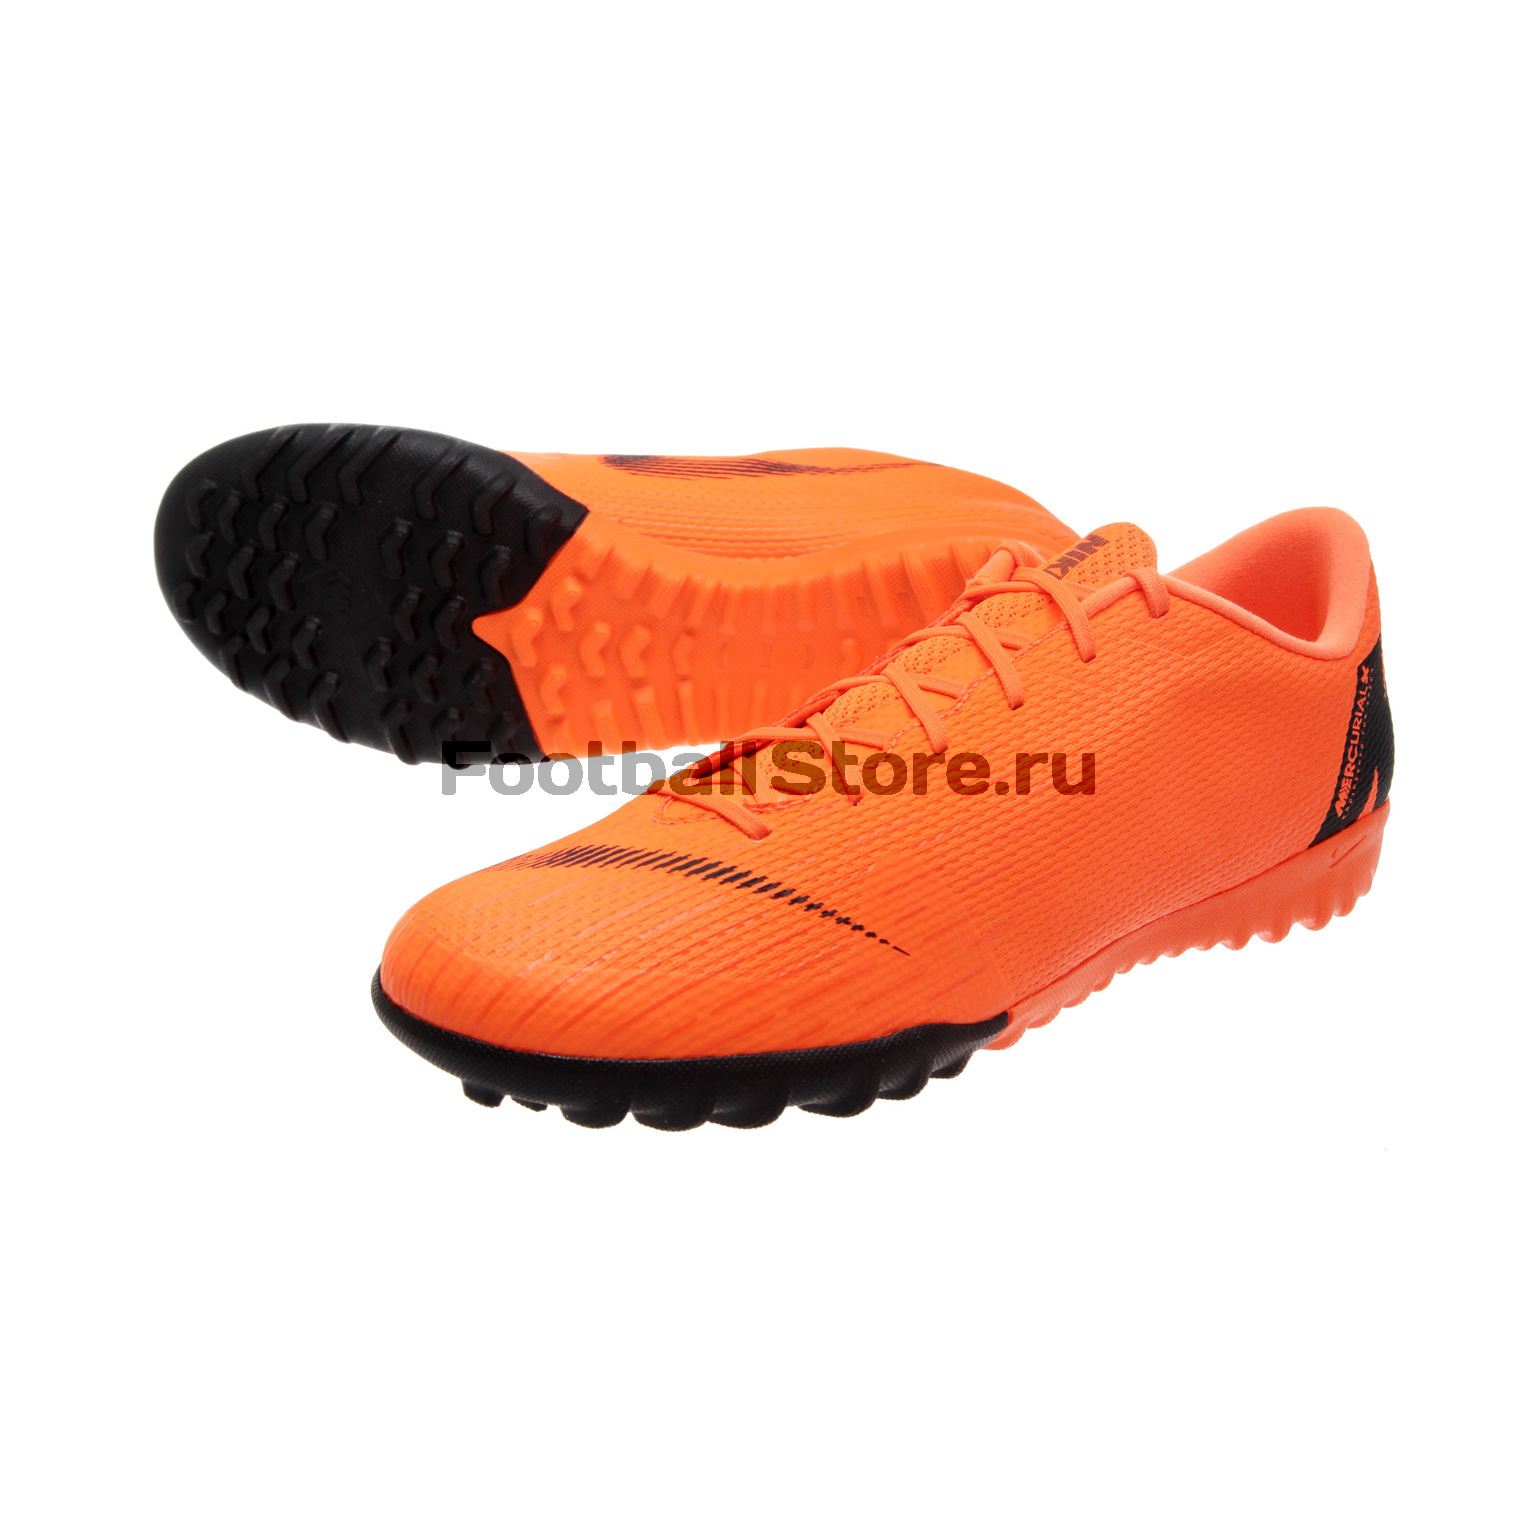 Шиповки Nike VaporX 12 Academy TF AH7384-810 шиповки nike elastico finale iii tf 685358 480 8 5 синий